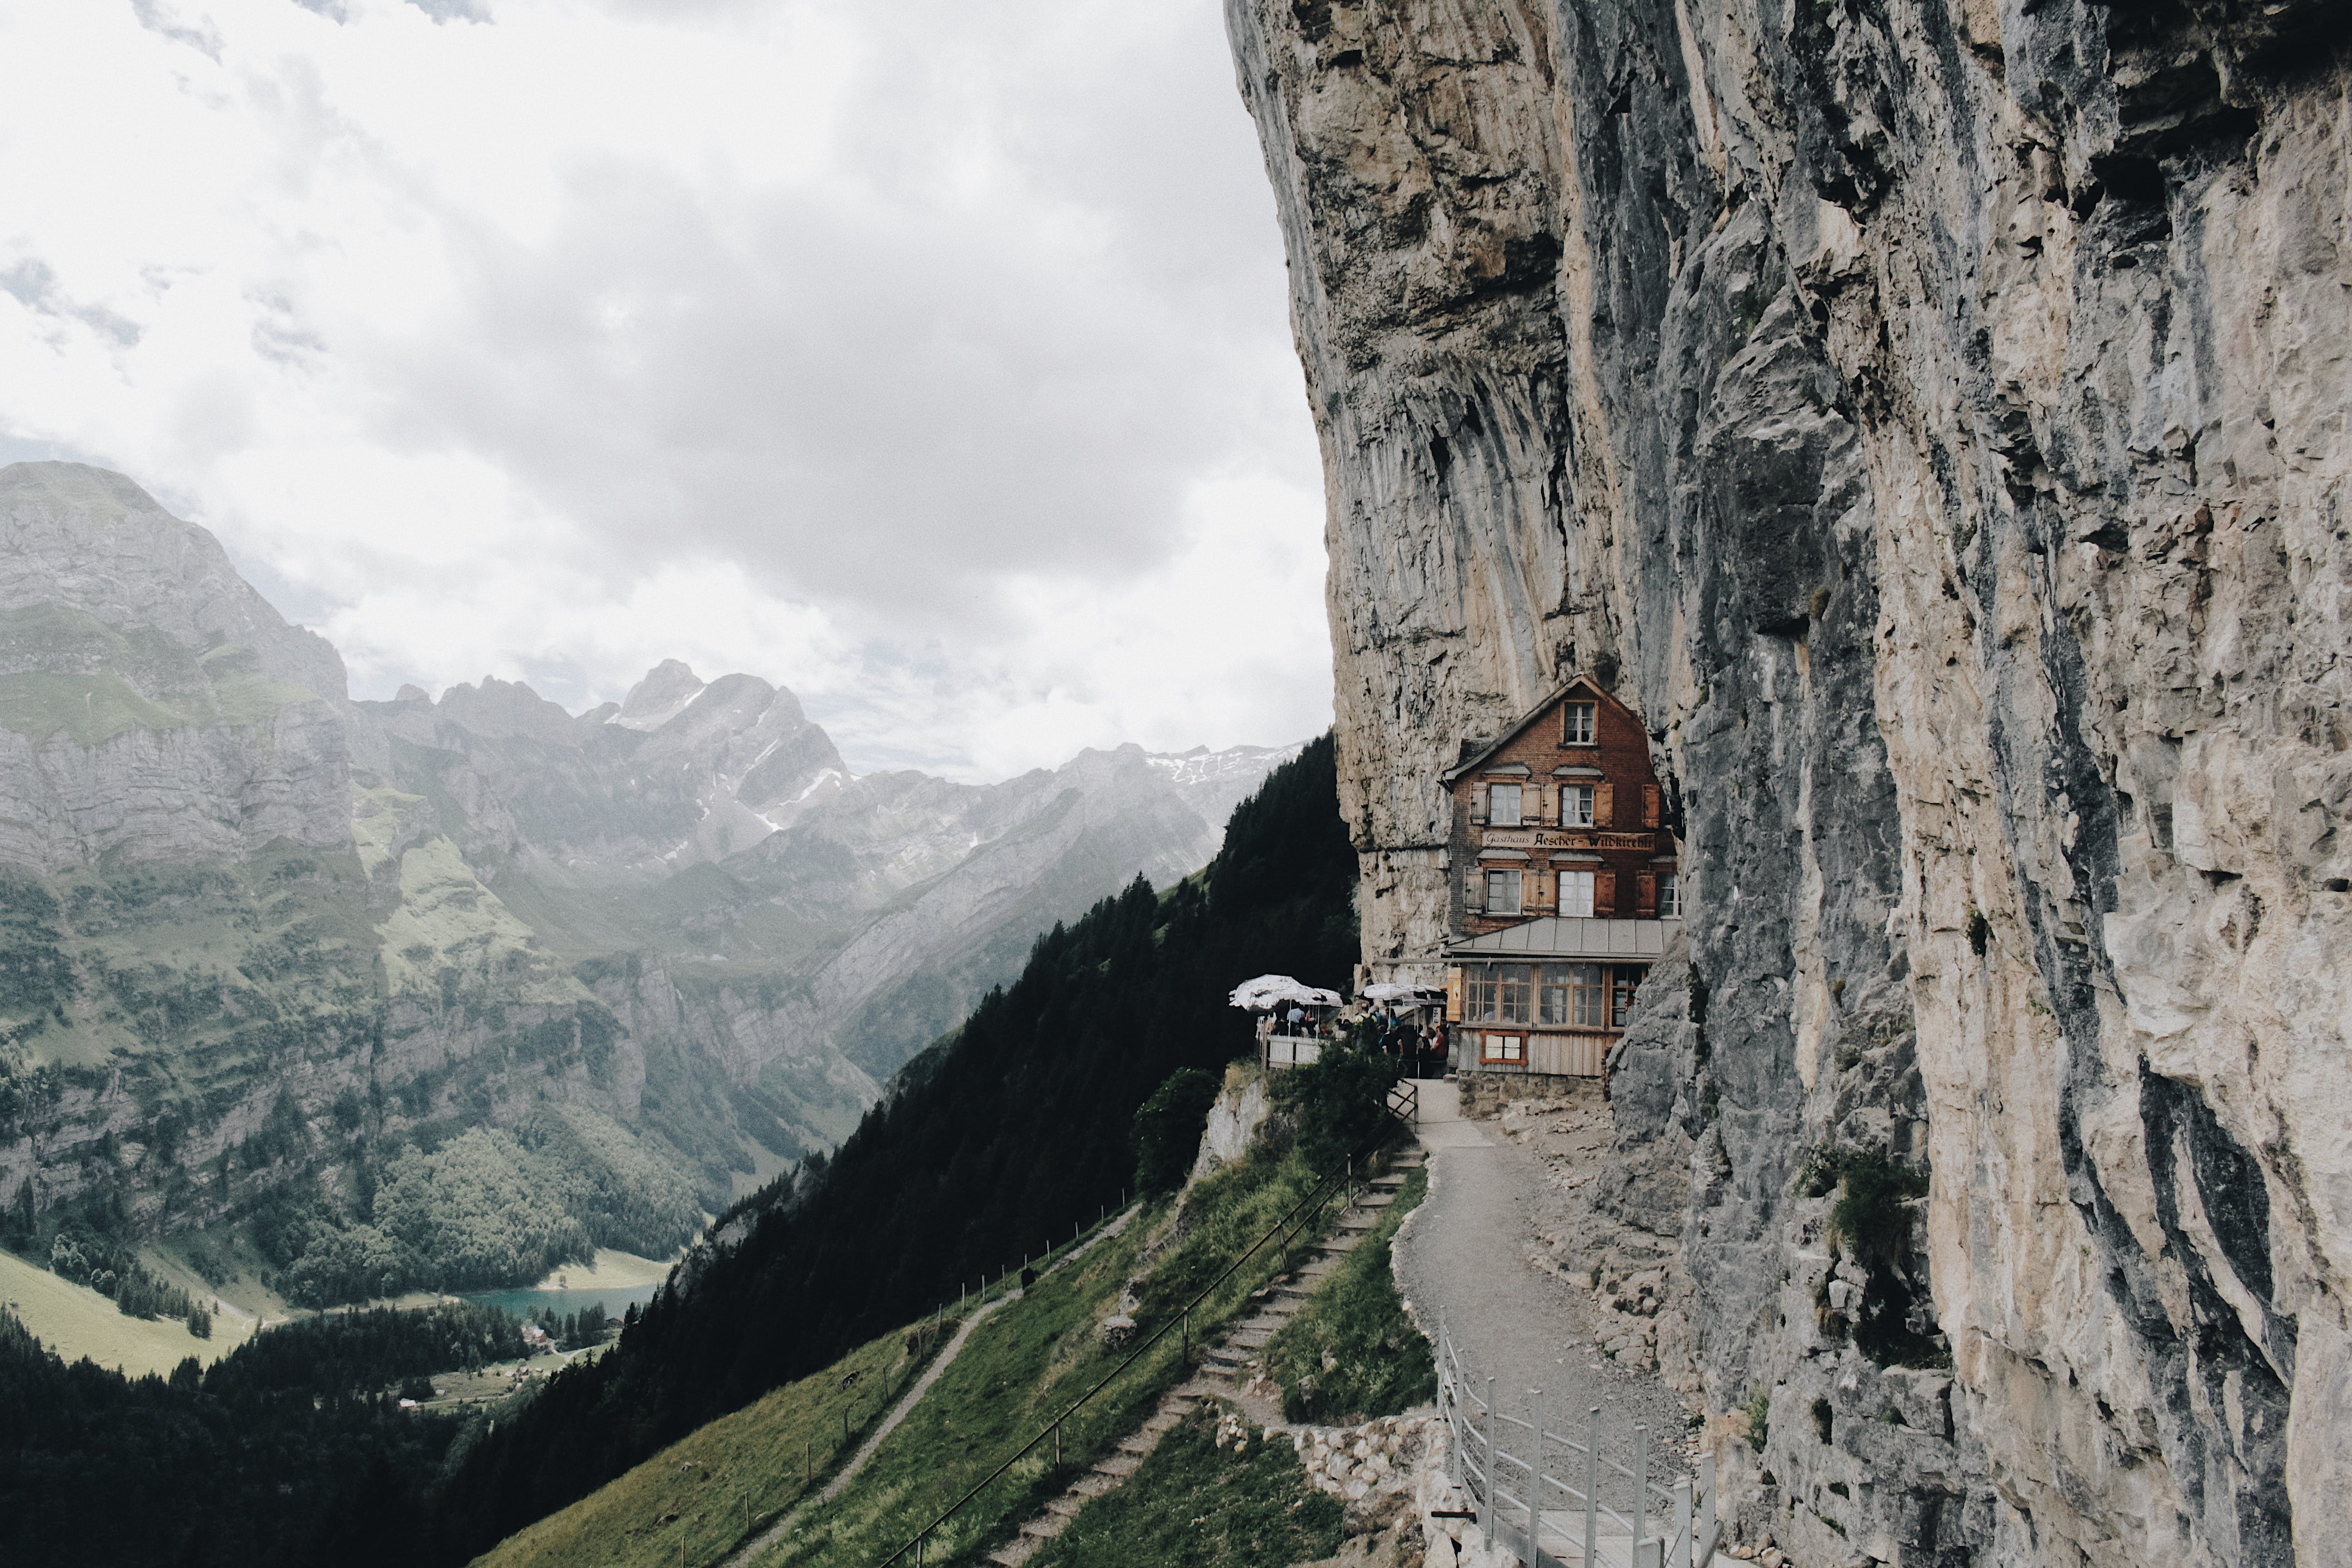 restaurant on mountain side